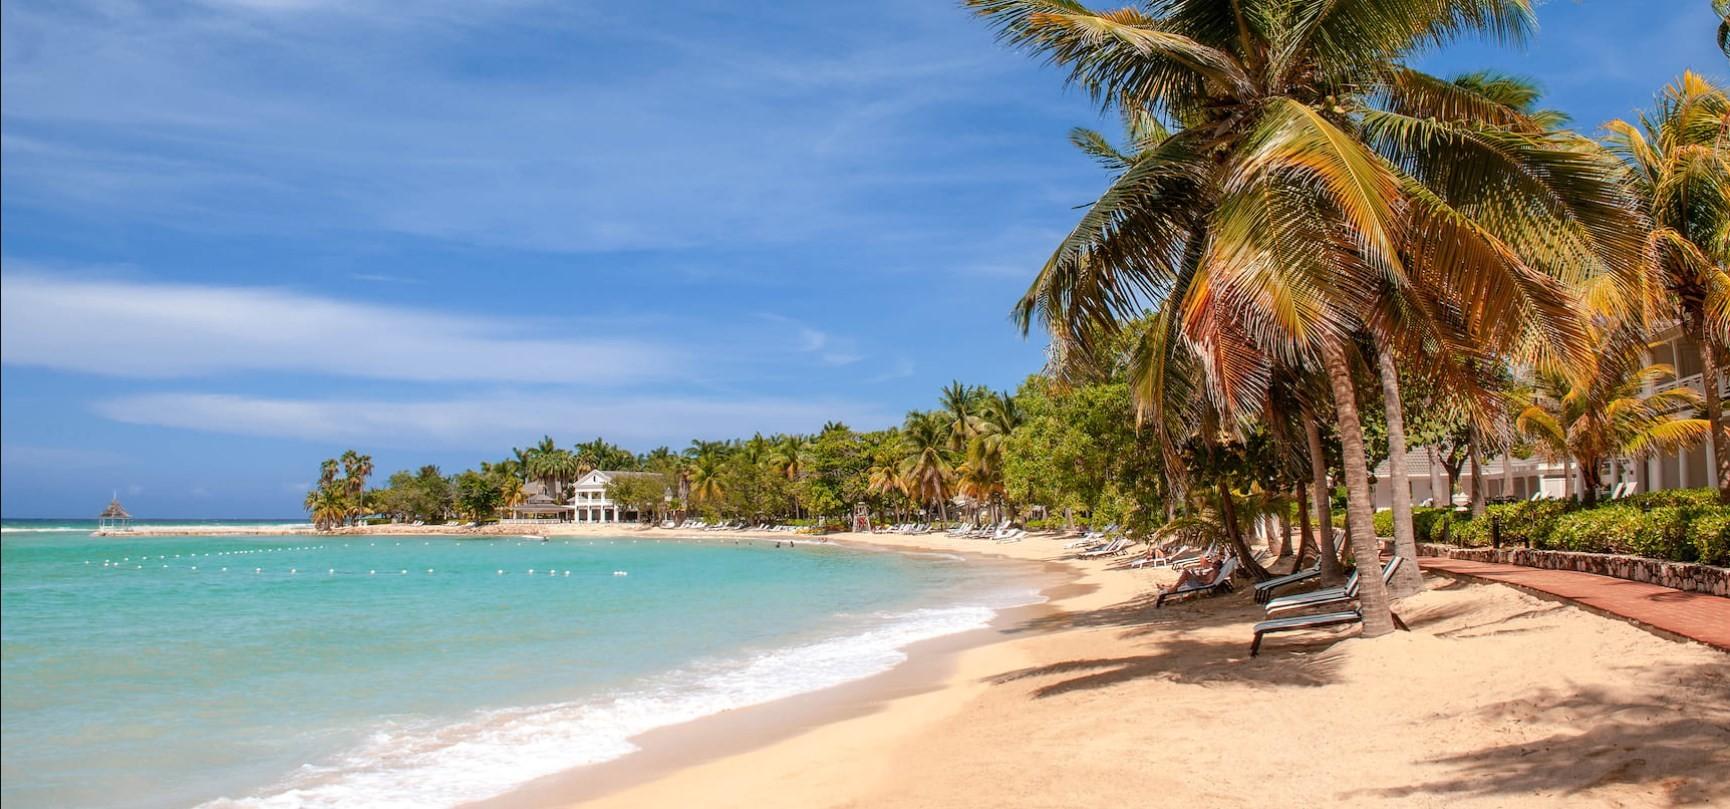 news-main-jamaica-is-getting-a-major-new-luxury-resort.1575645303.jpg